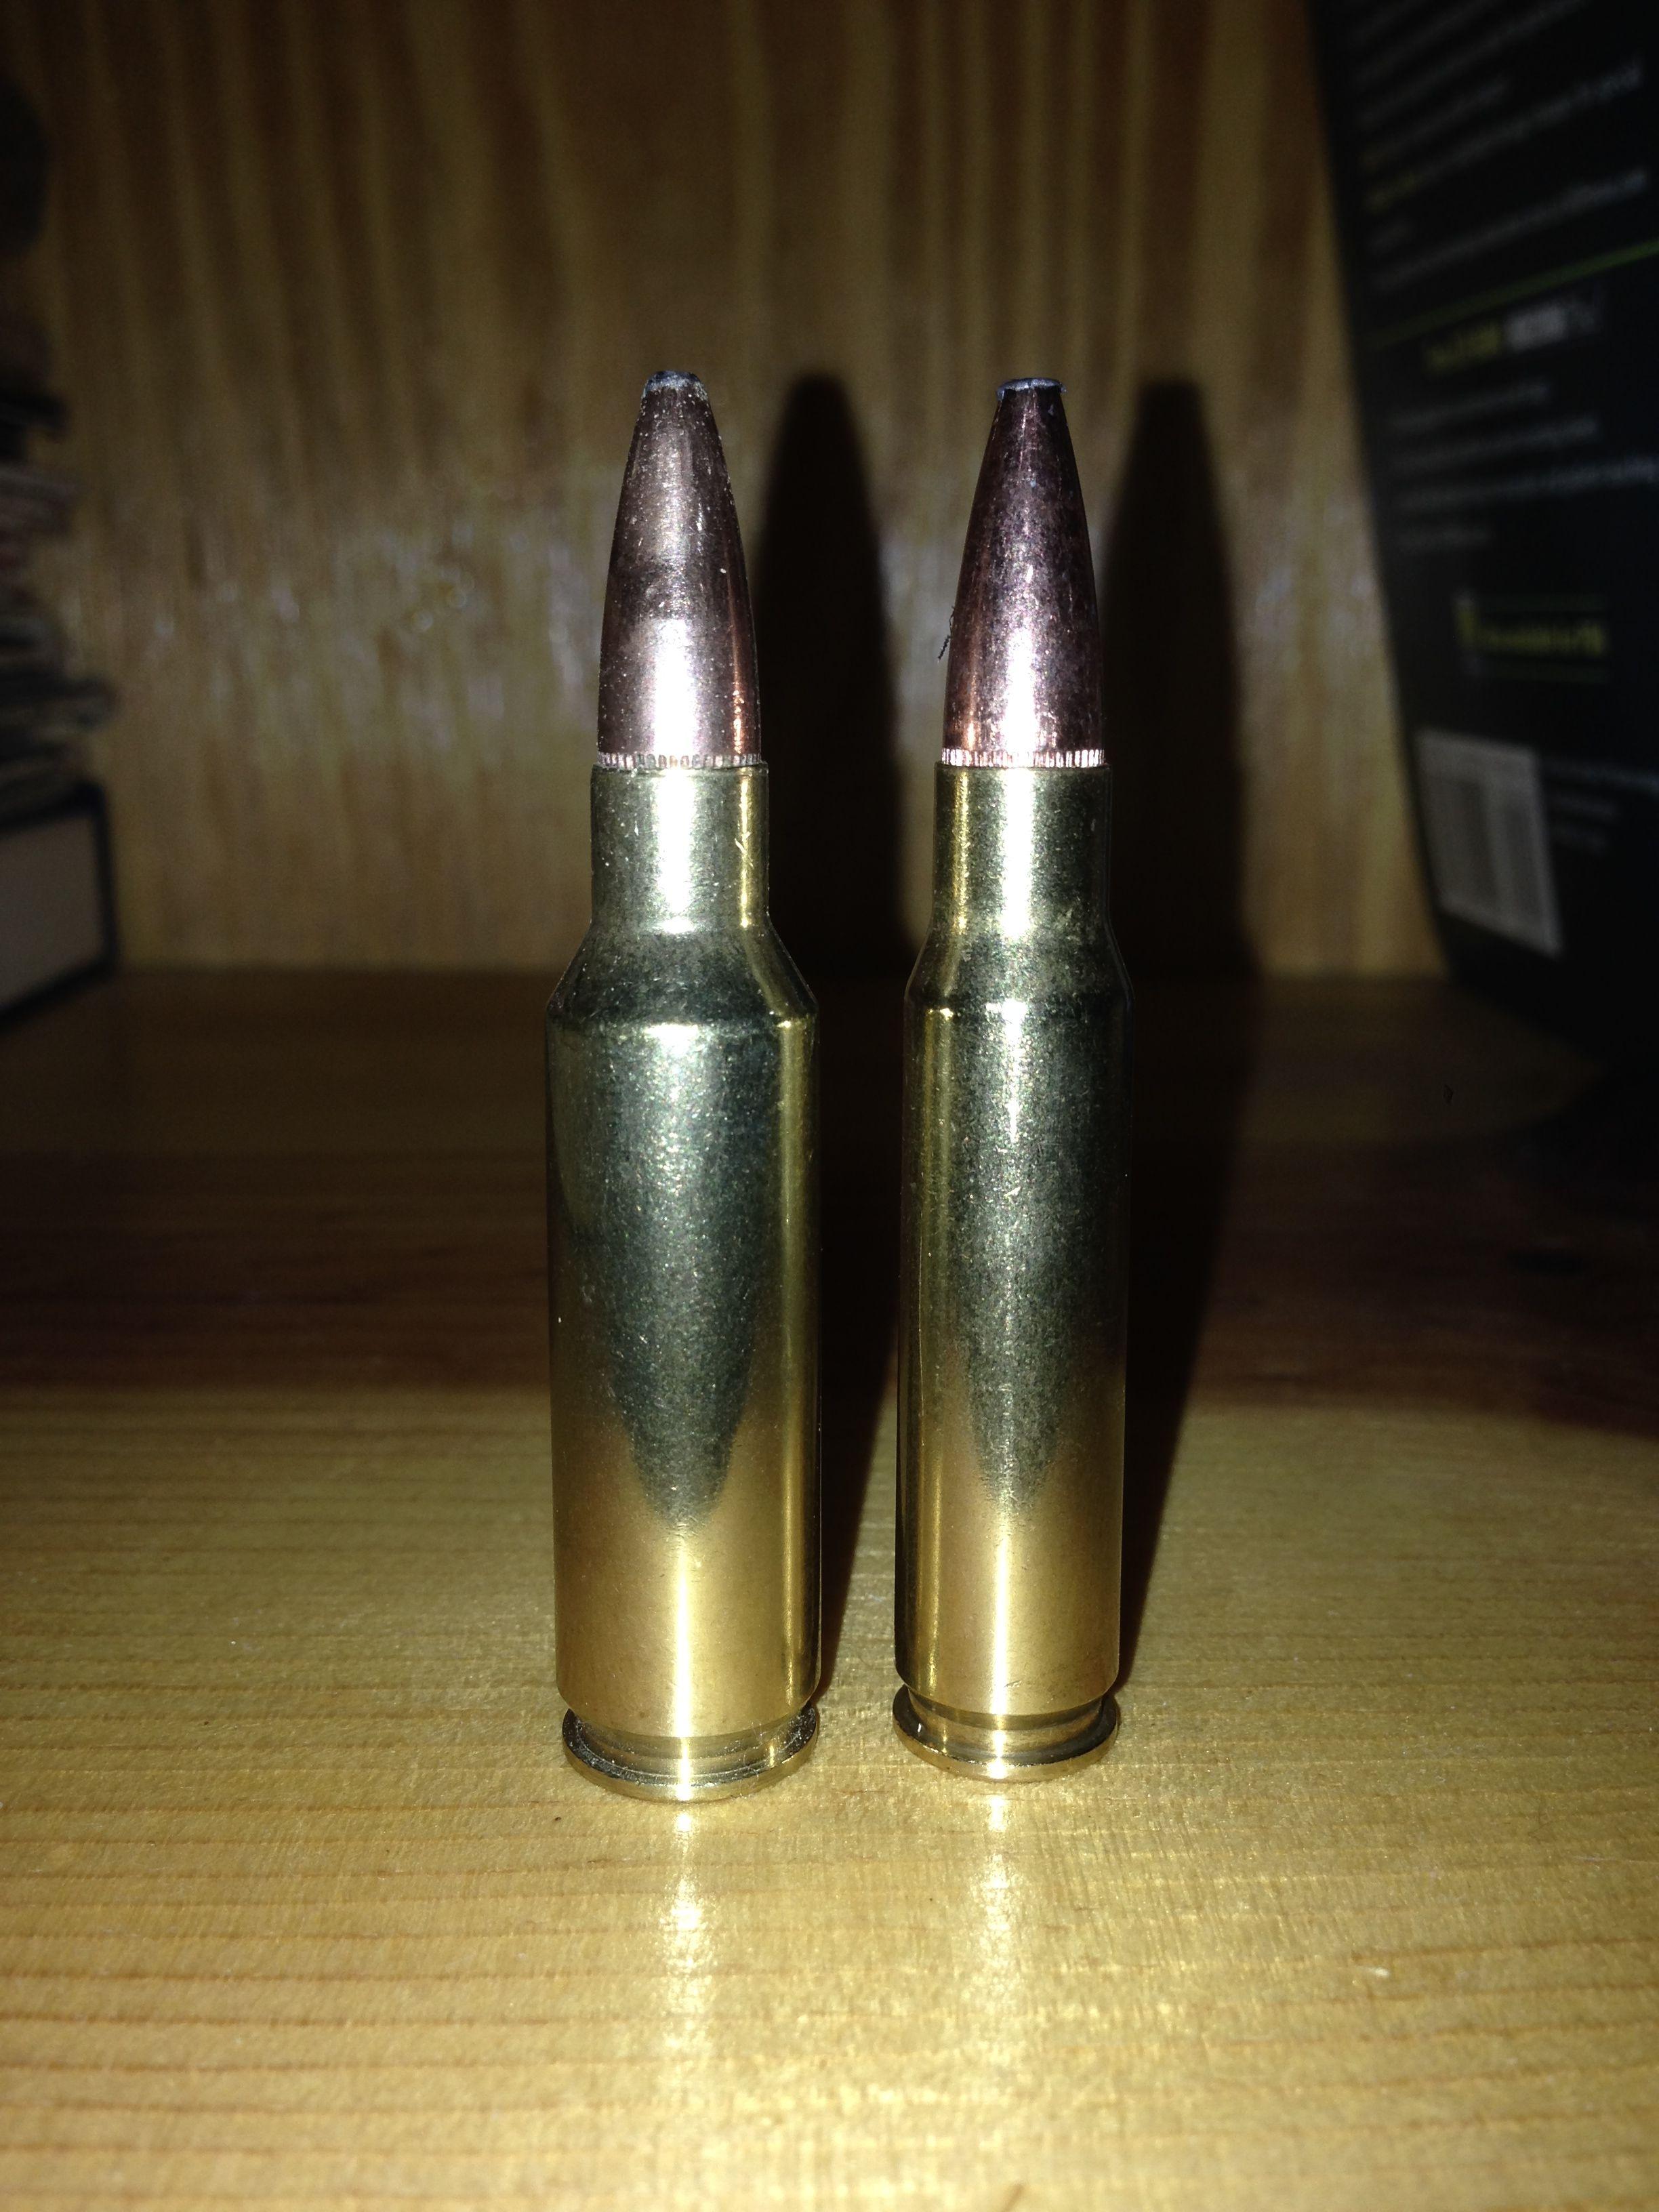 Gun room amp trophy room done hunting -  300 Saum Vs 308 Win Huntingguns